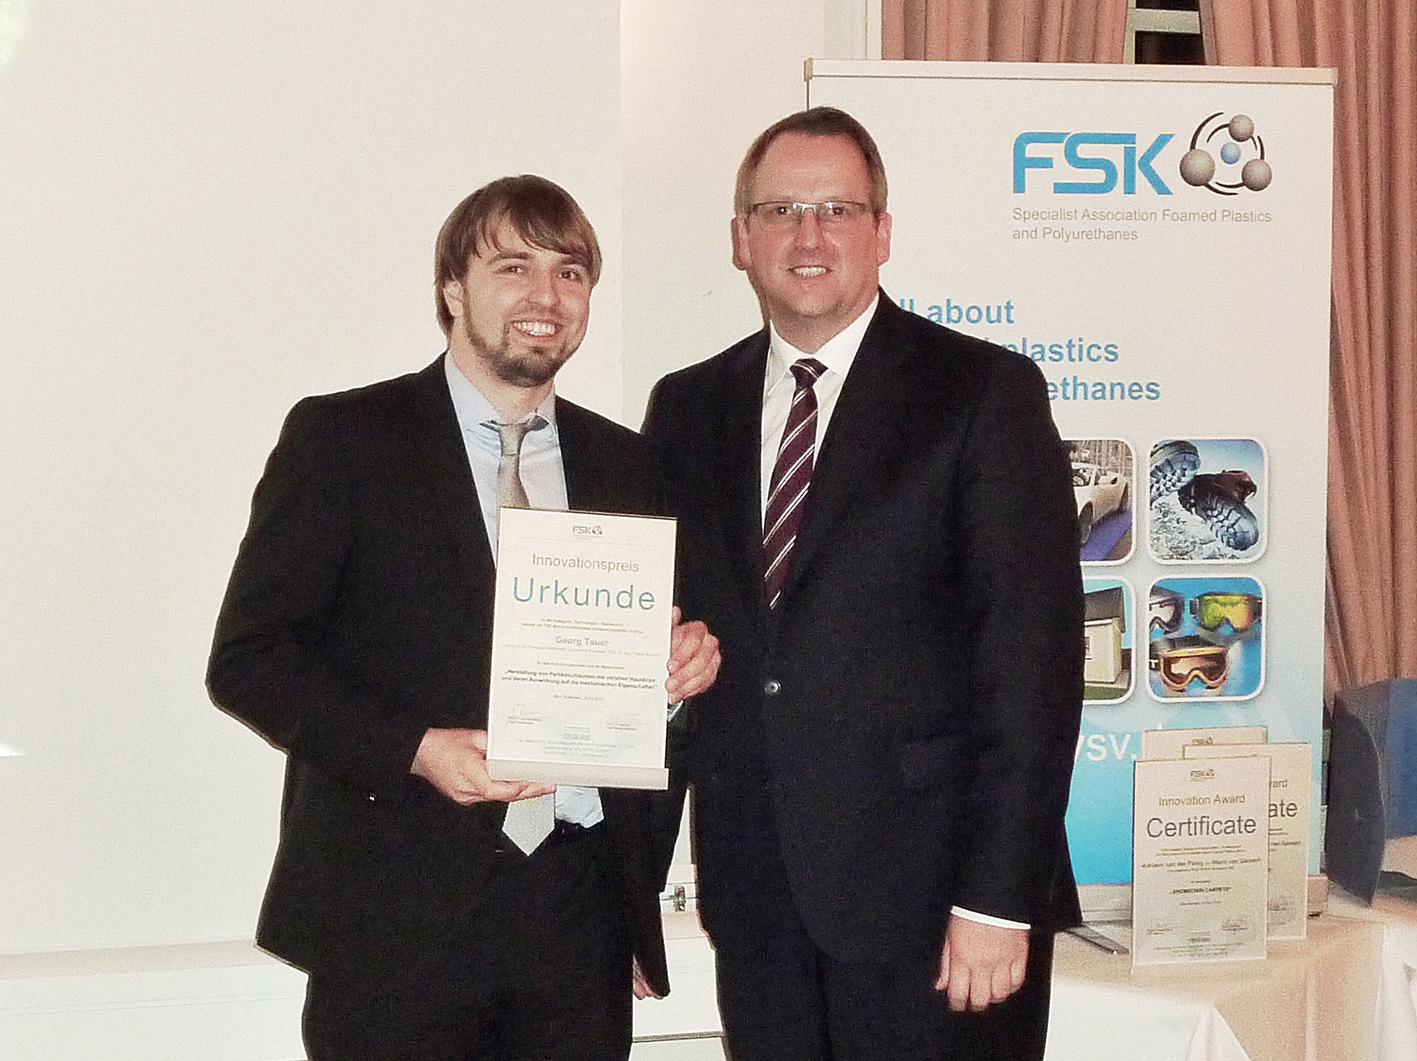 Preisverleihung FSK Innovationspreis Schaumkunstsoffe 2016 | Polymer Engineering Bayreuth